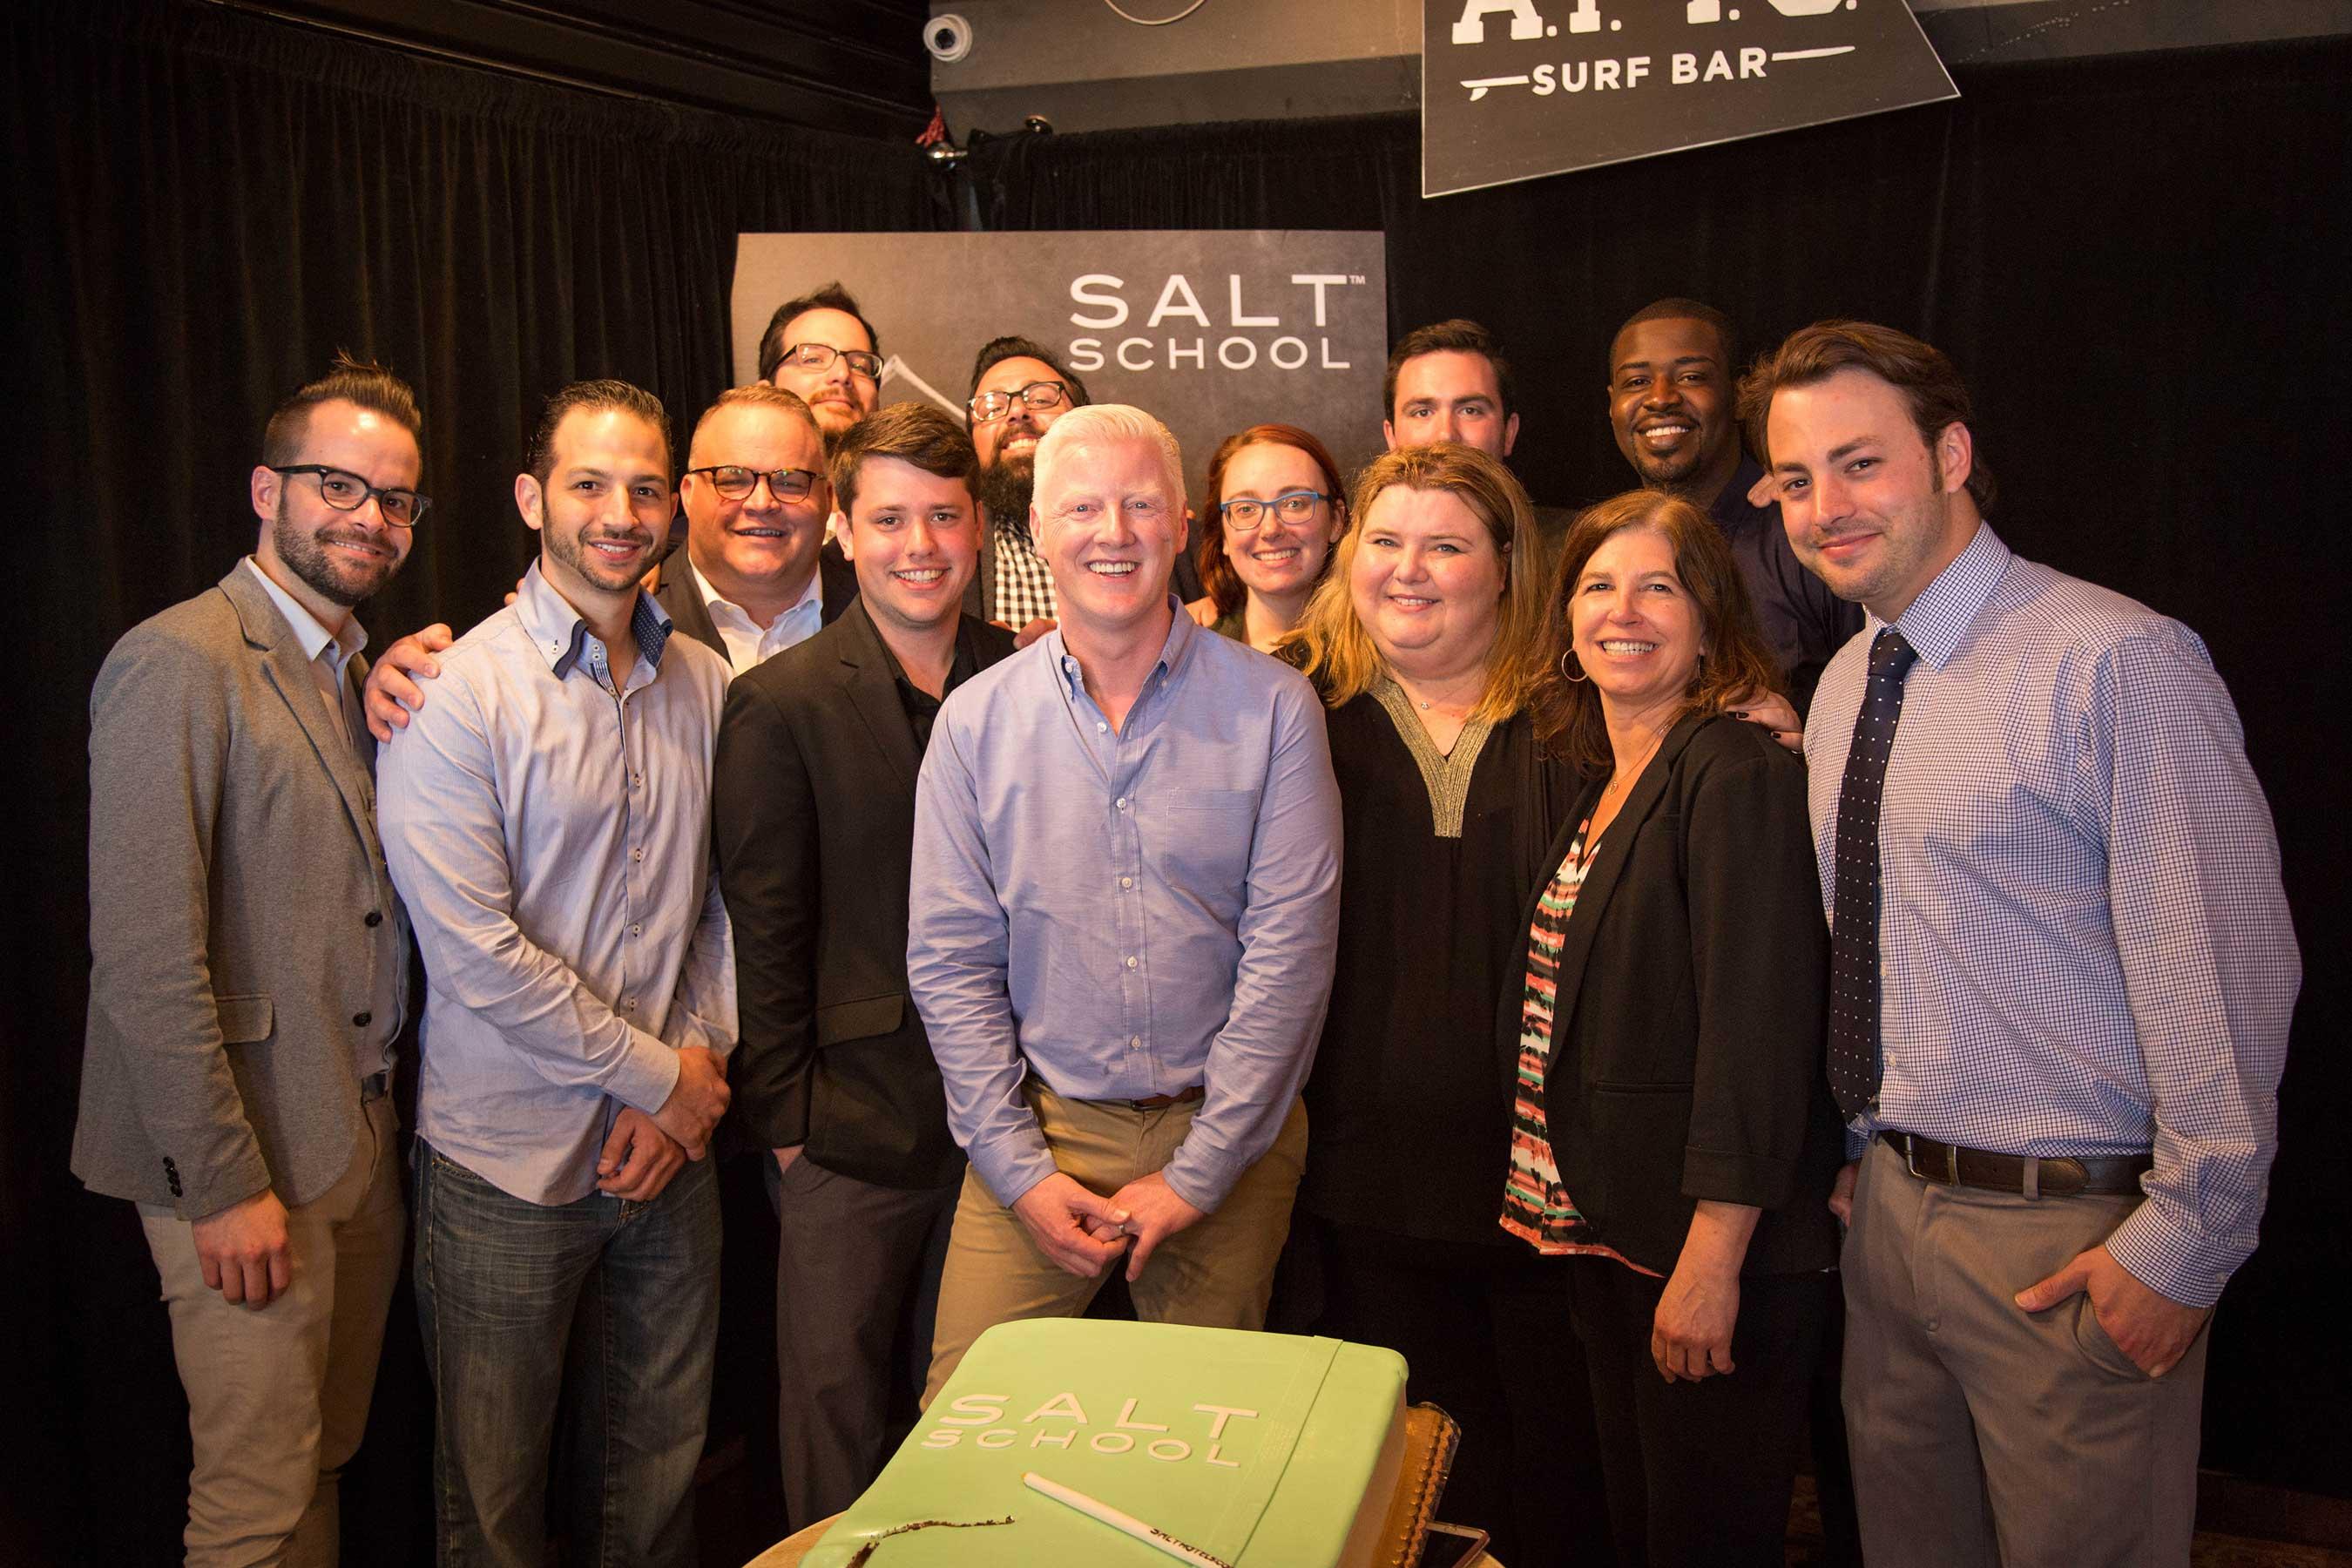 Executive team behind Salt School, hospitality training program in conjunction with The Asbury Hotel, Asbury Park, NJ